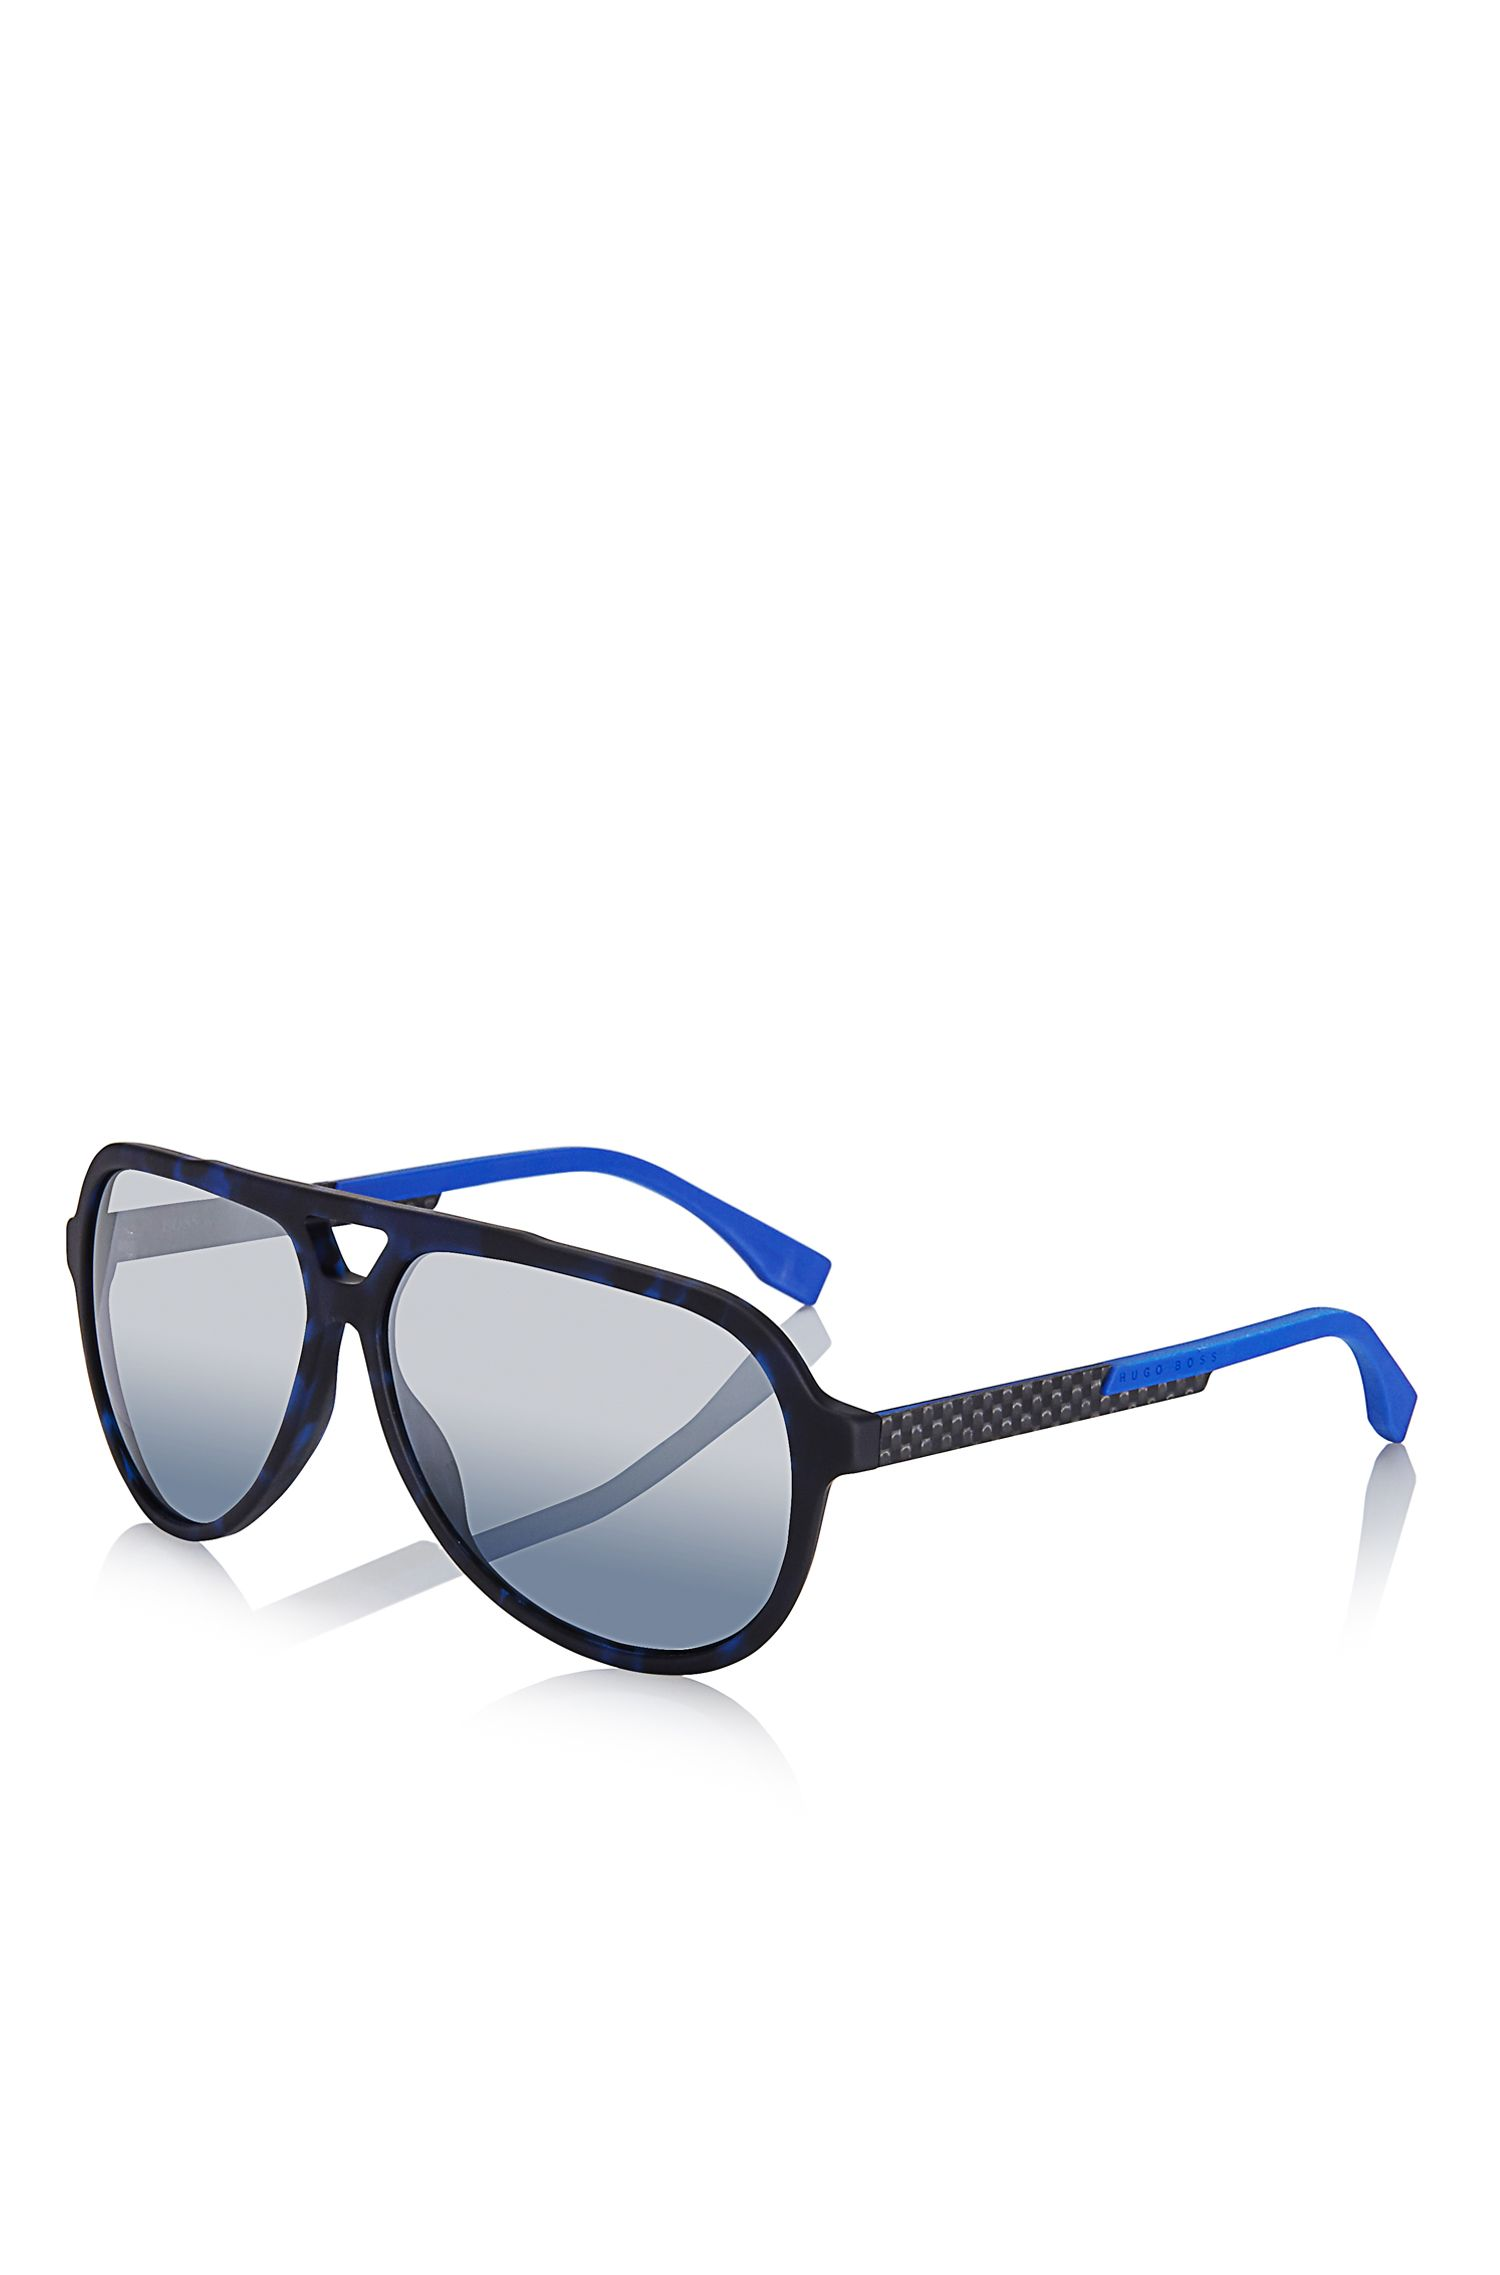 'BOSS 0731S' | Mirror Lens Carbon Fiber Aviator Sunglasses